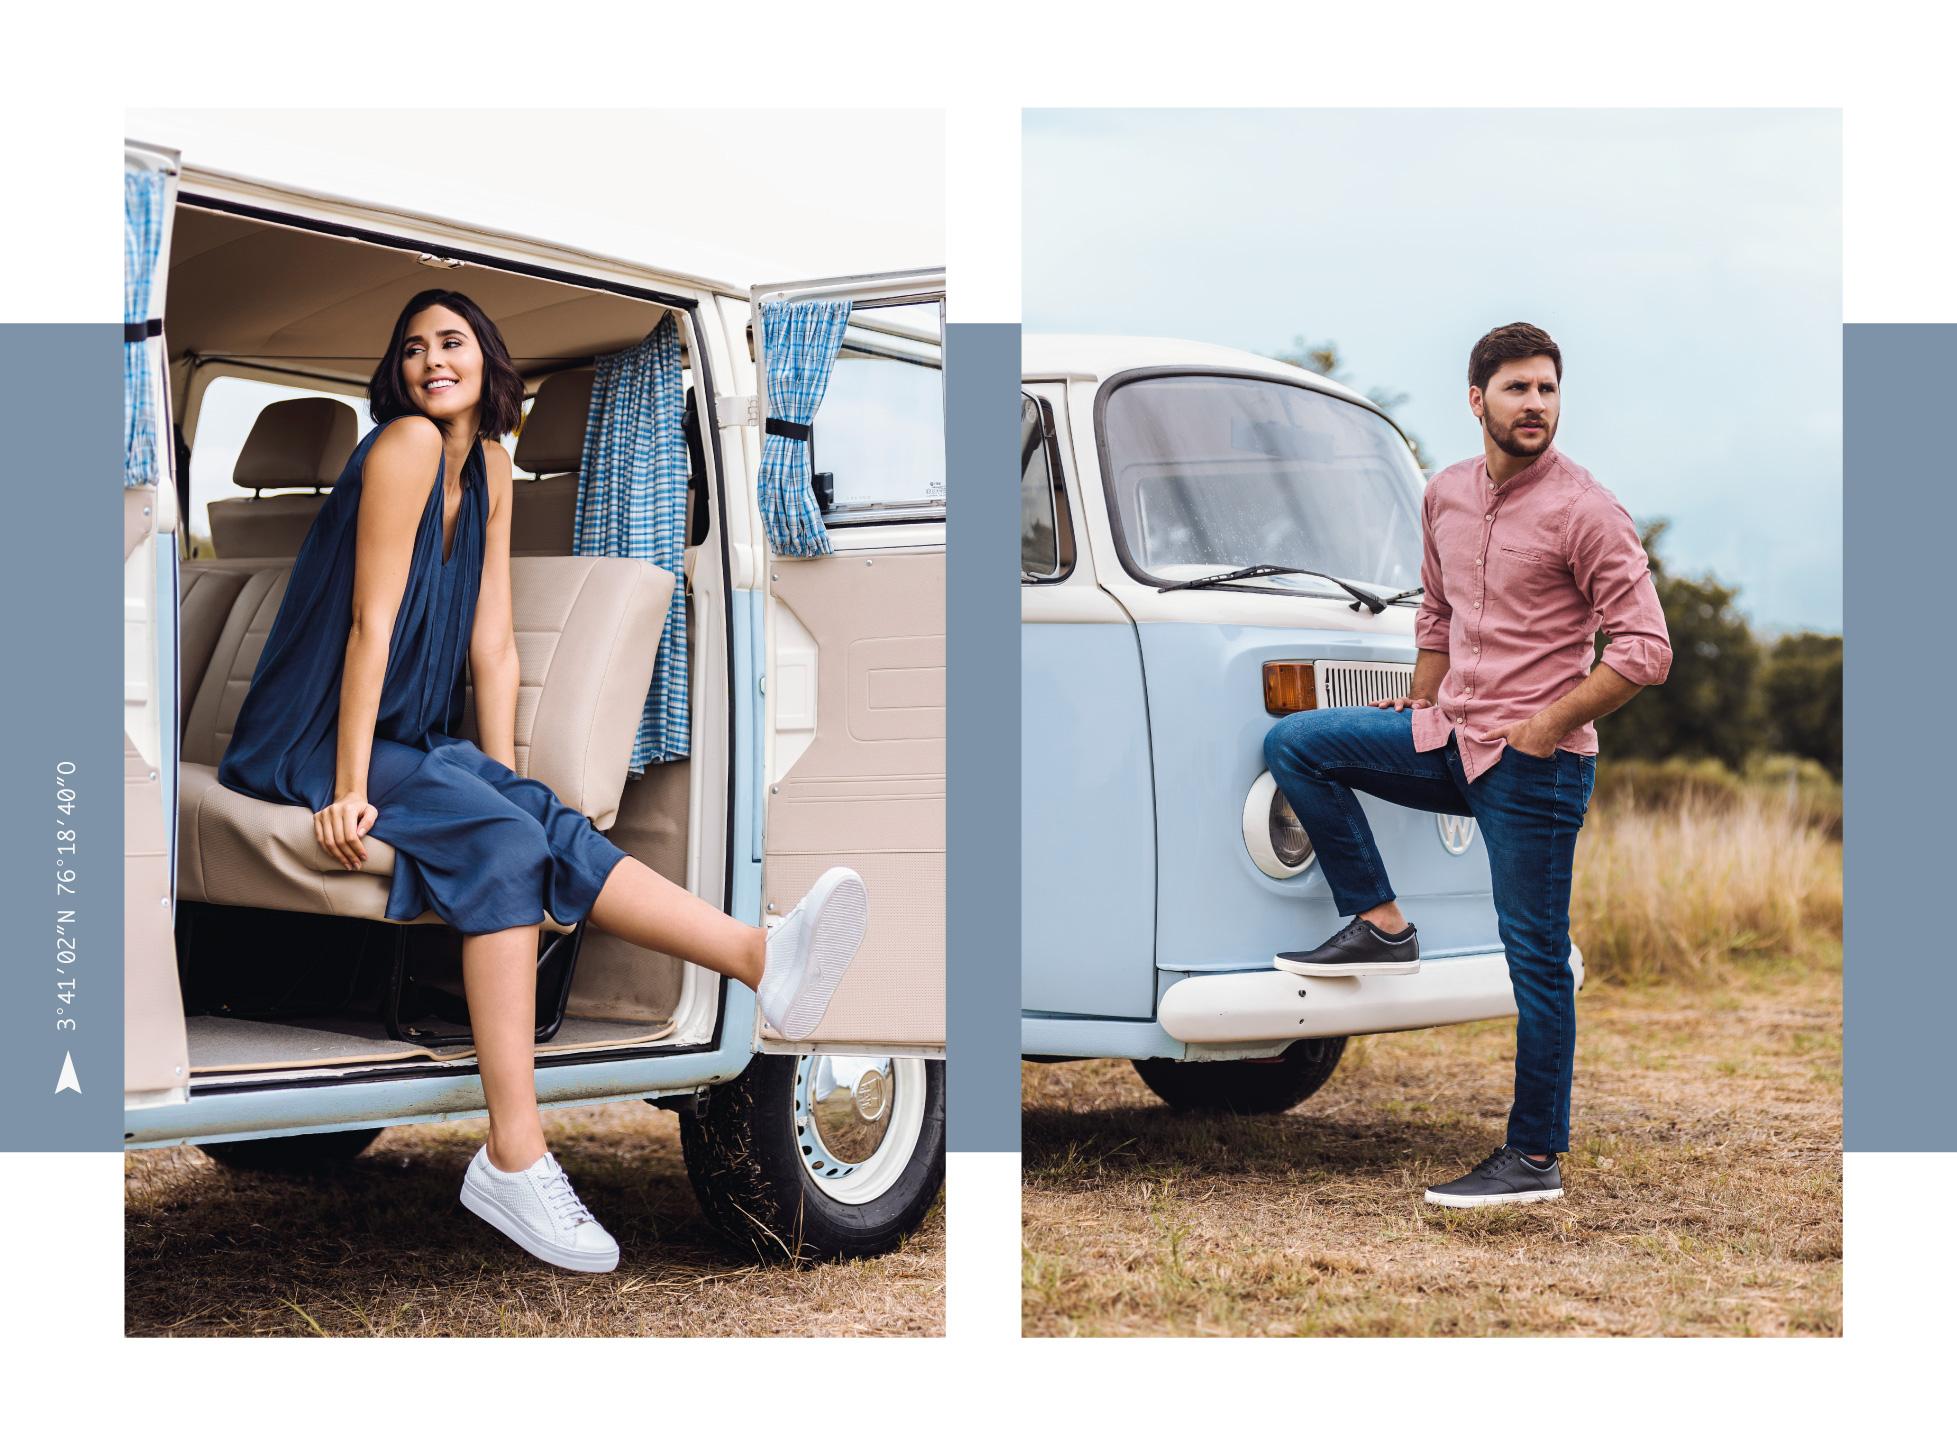 Josh-Verano-Cali-Shoes-Life-Campaña-2